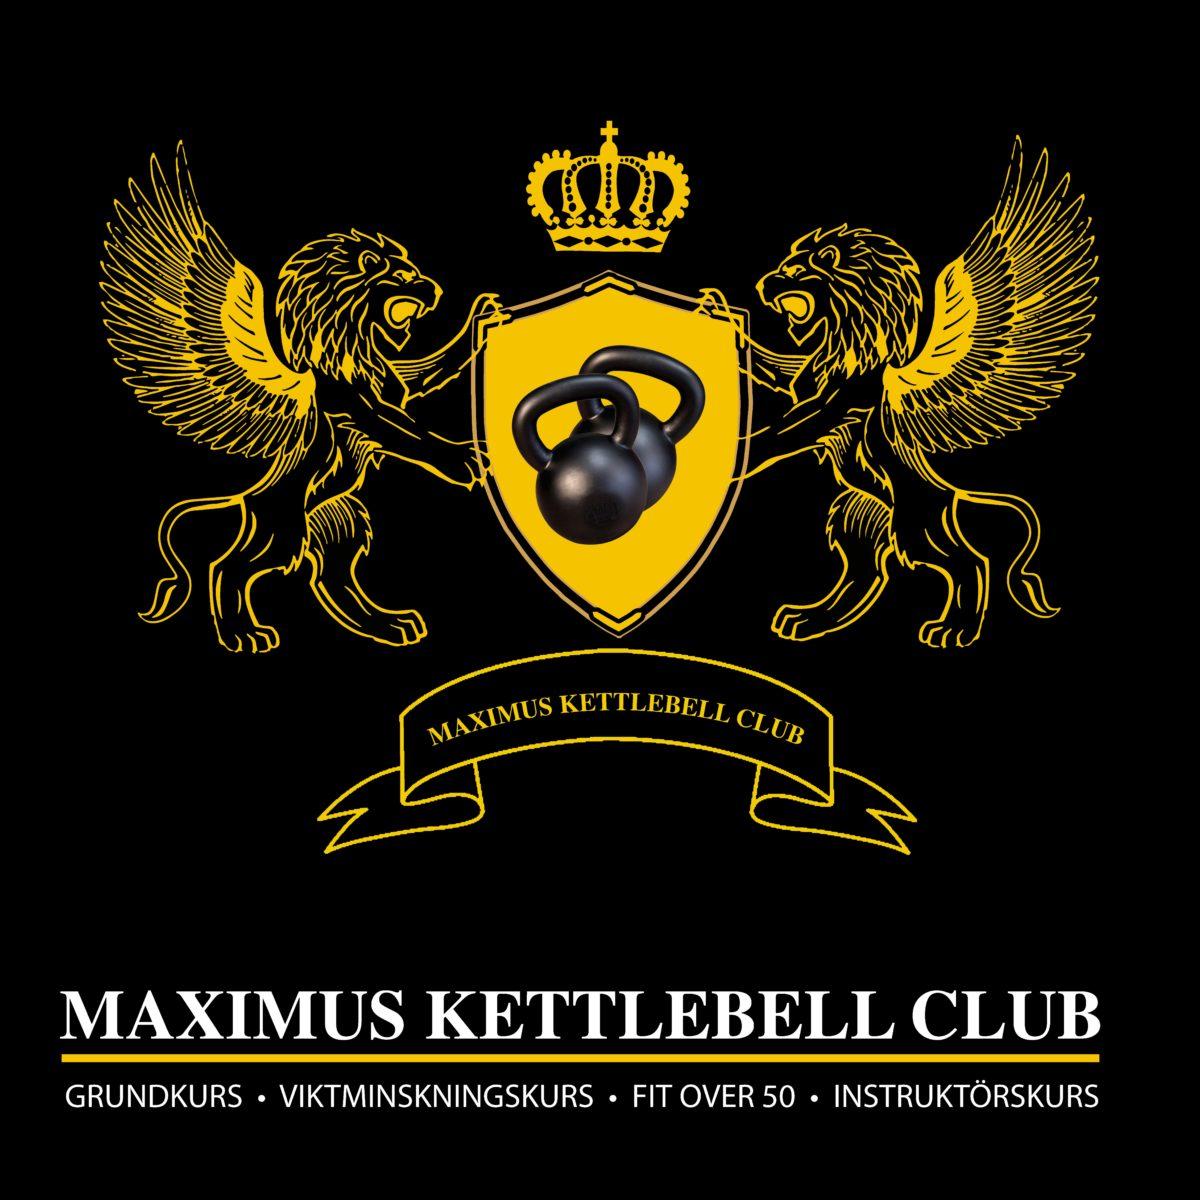 Grundkurs i Kettlebells-Girya Level-1